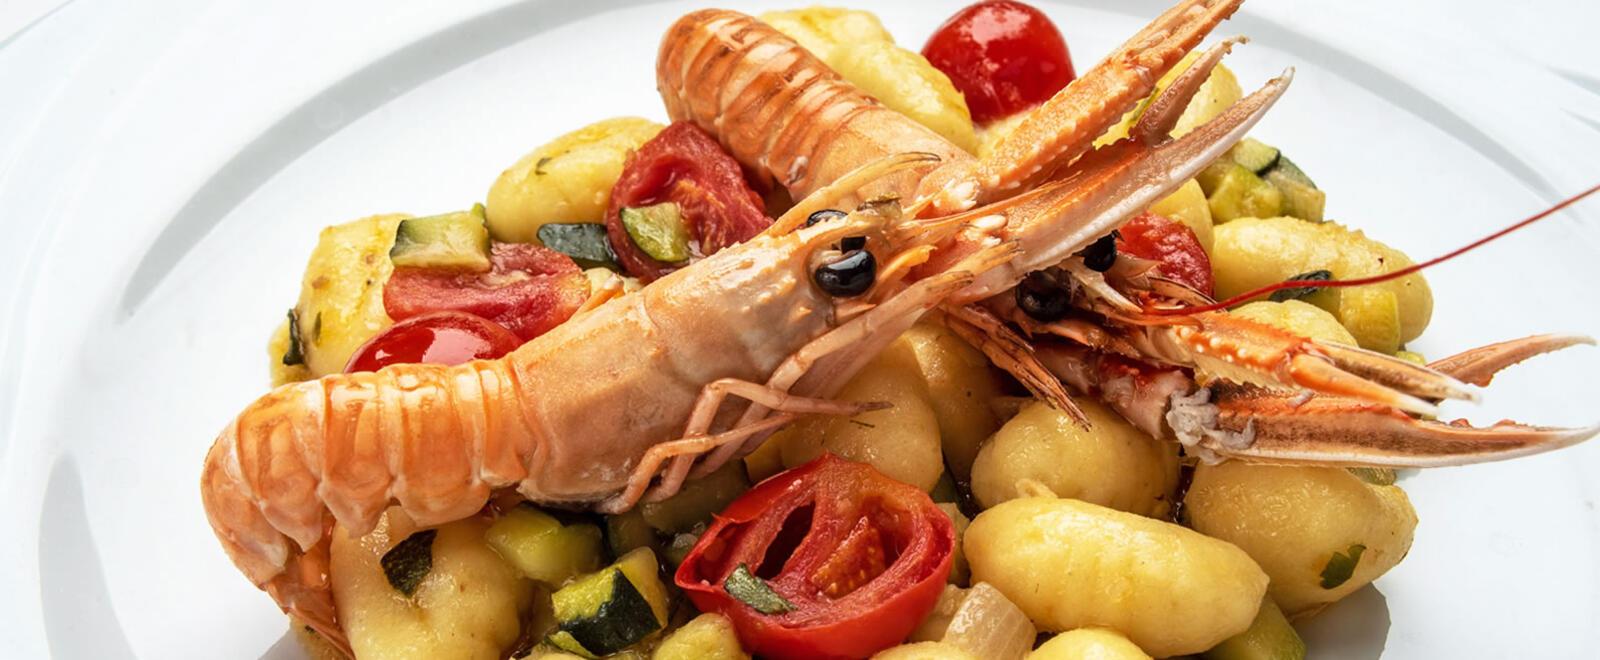 fortunaresort de restaurant-chianciano-terme 019